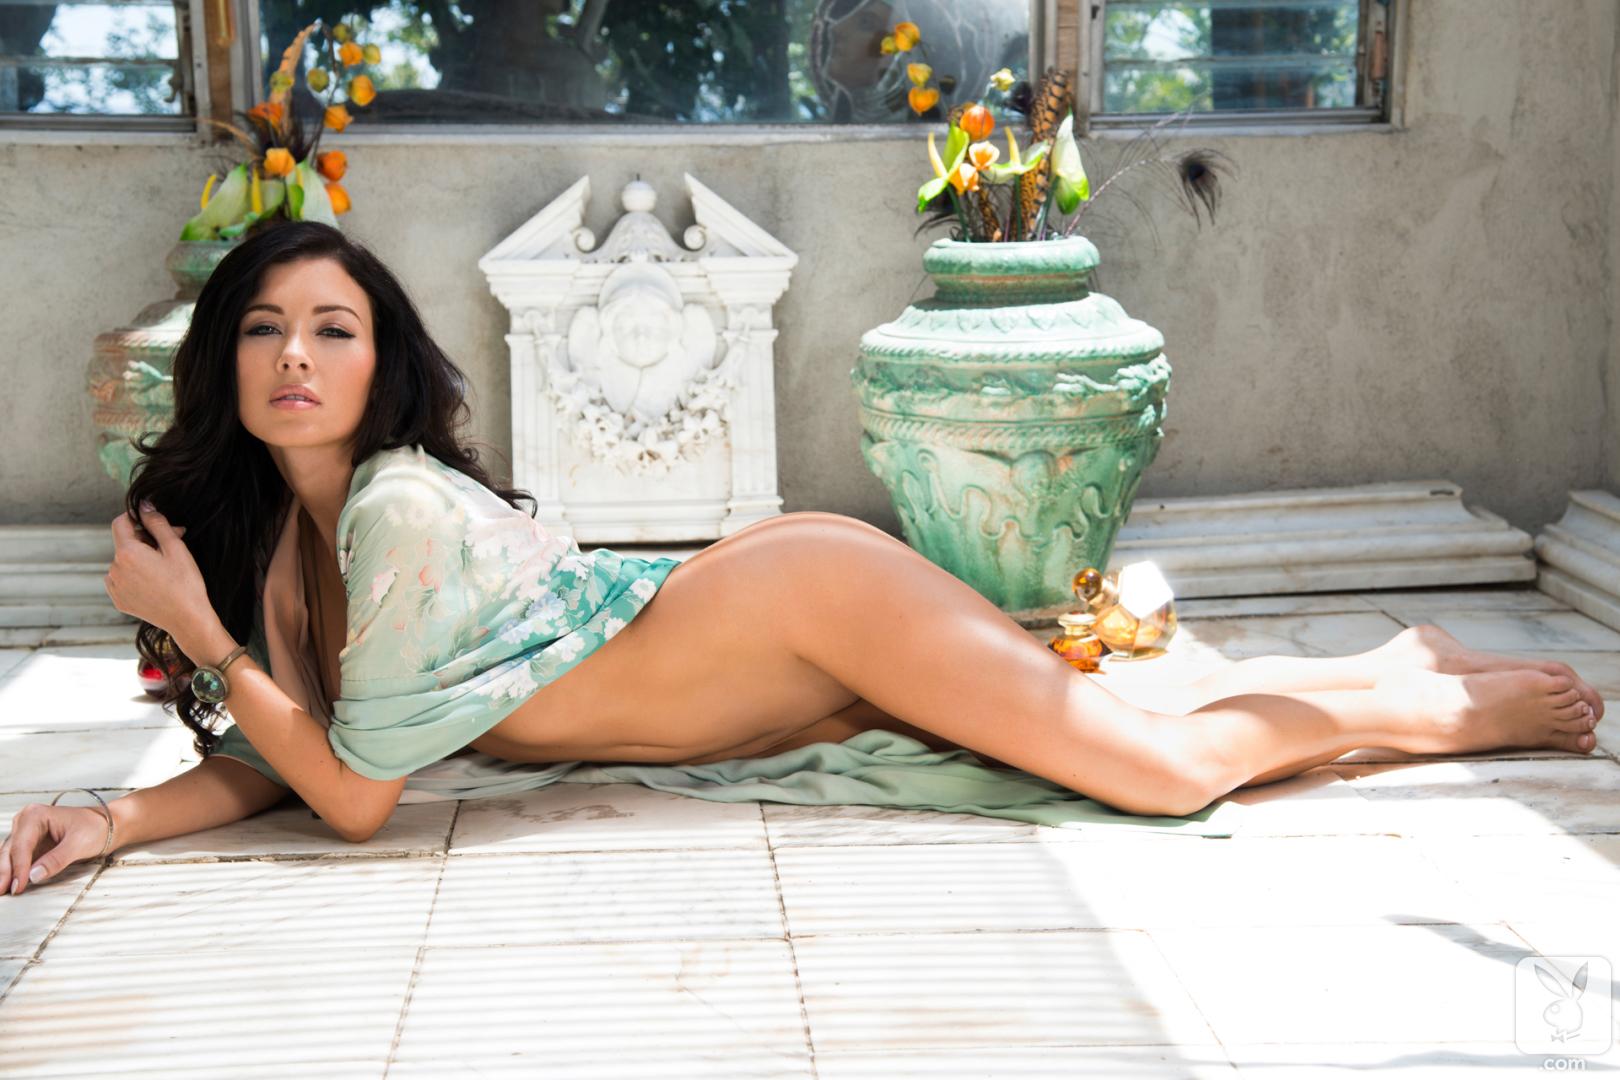 Gemma Lee Farrell Nude Amazing gemma lee farrell in sensual goddess - playmates nudes | playboyplus